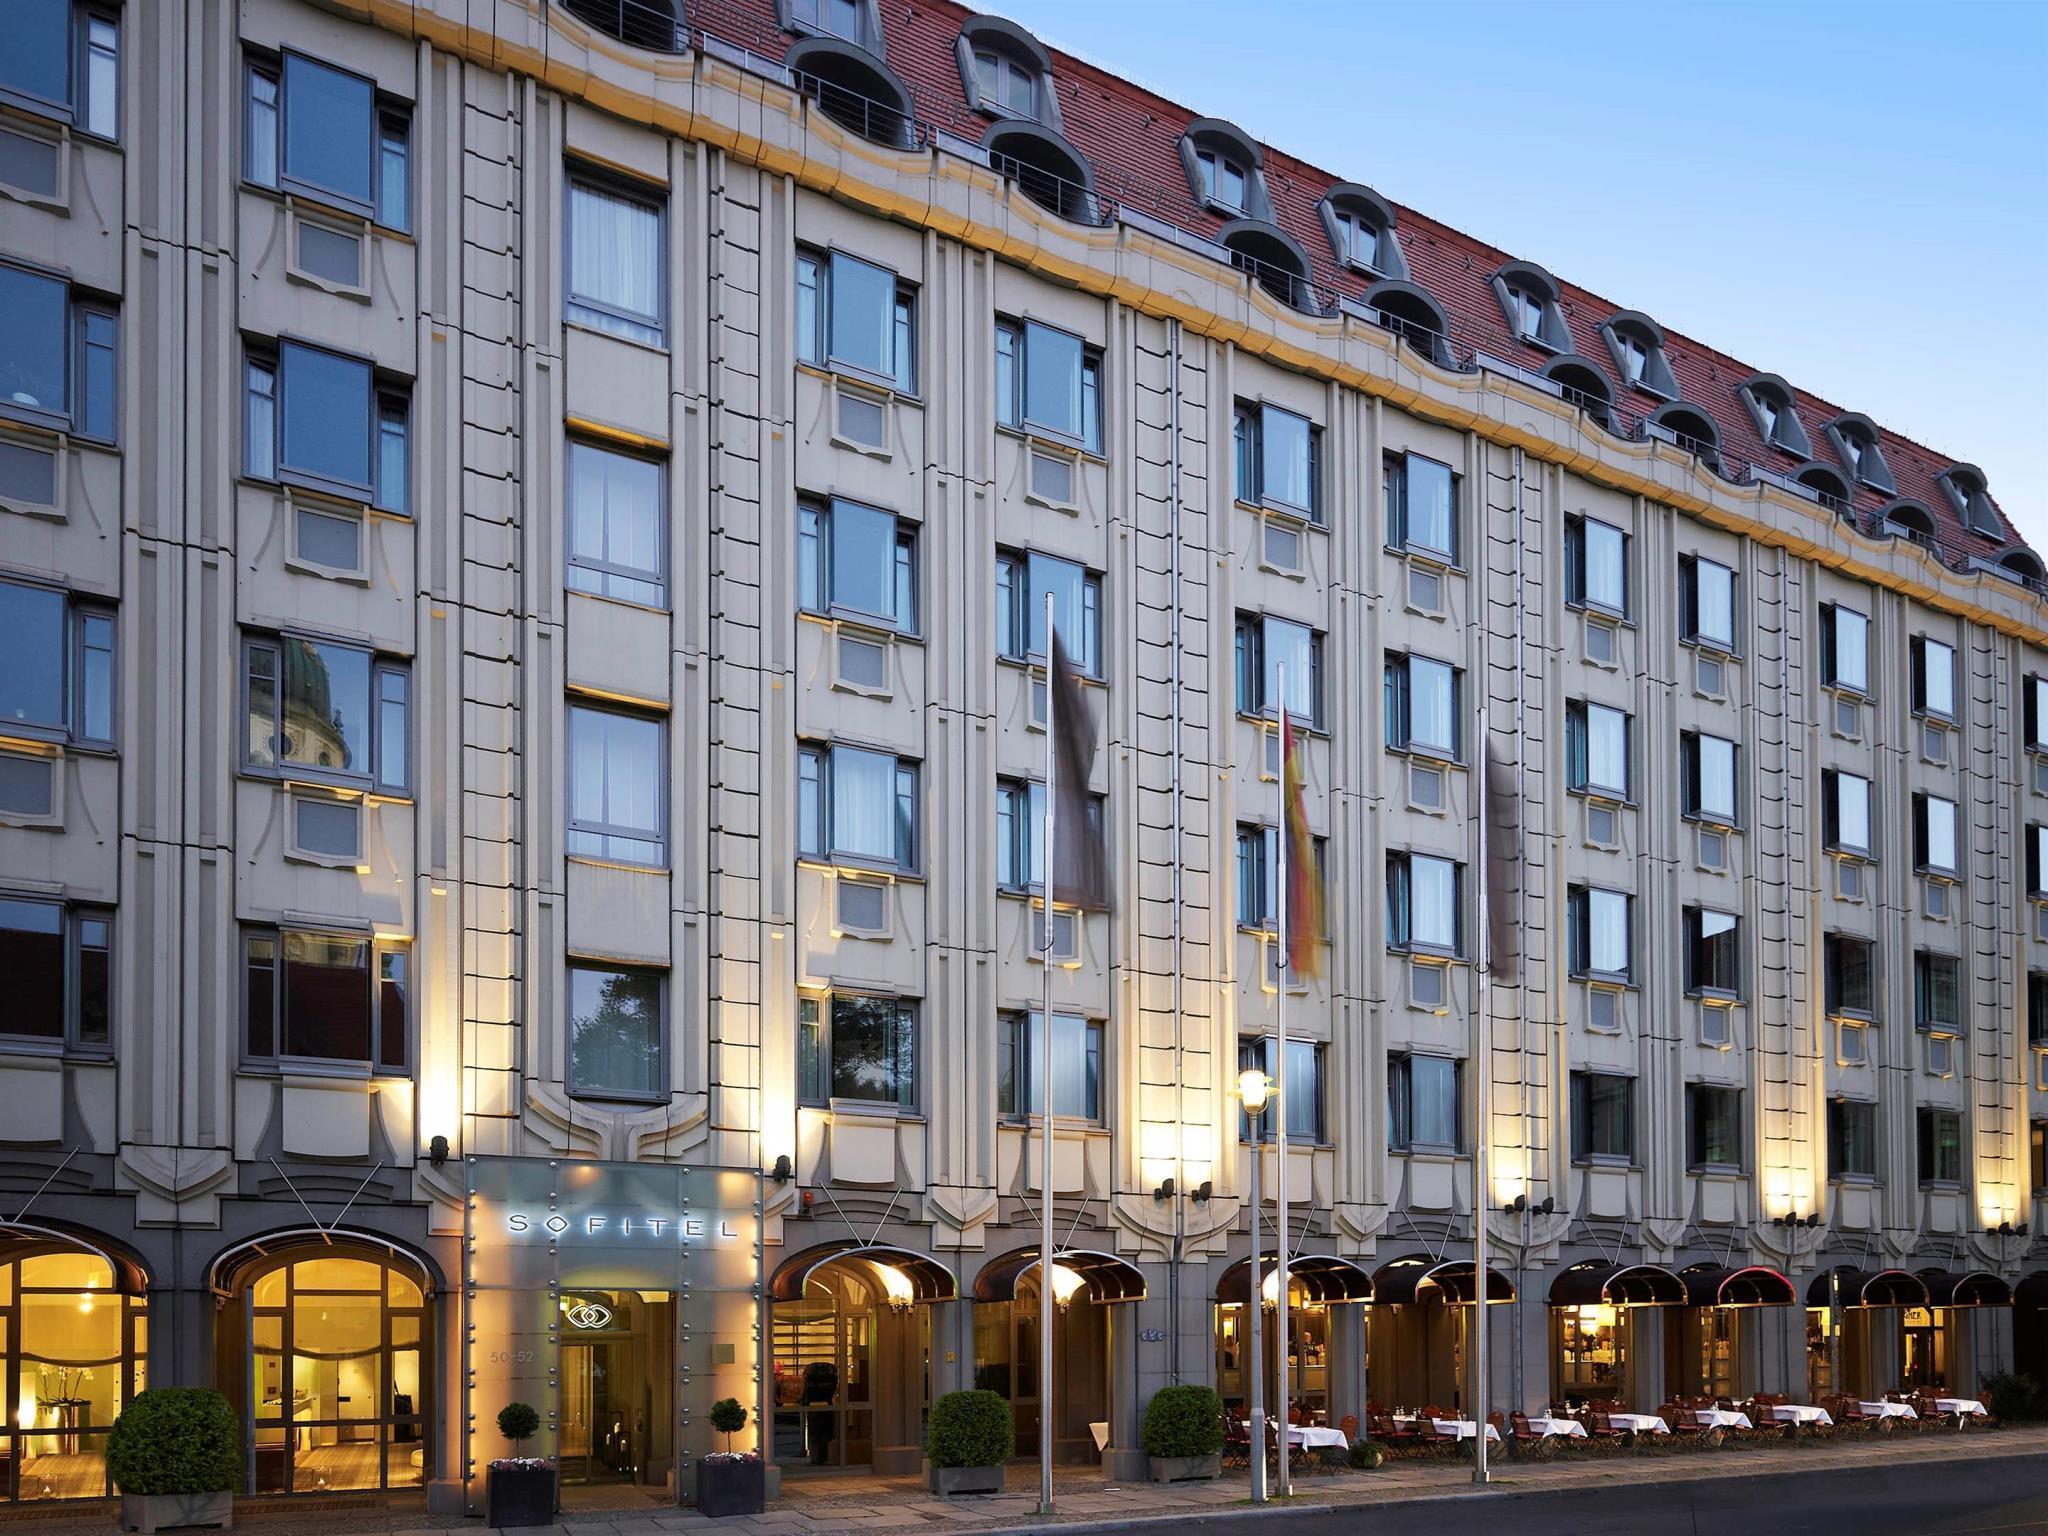 Sofitel Berlin Gendarmenmarkt Hotel